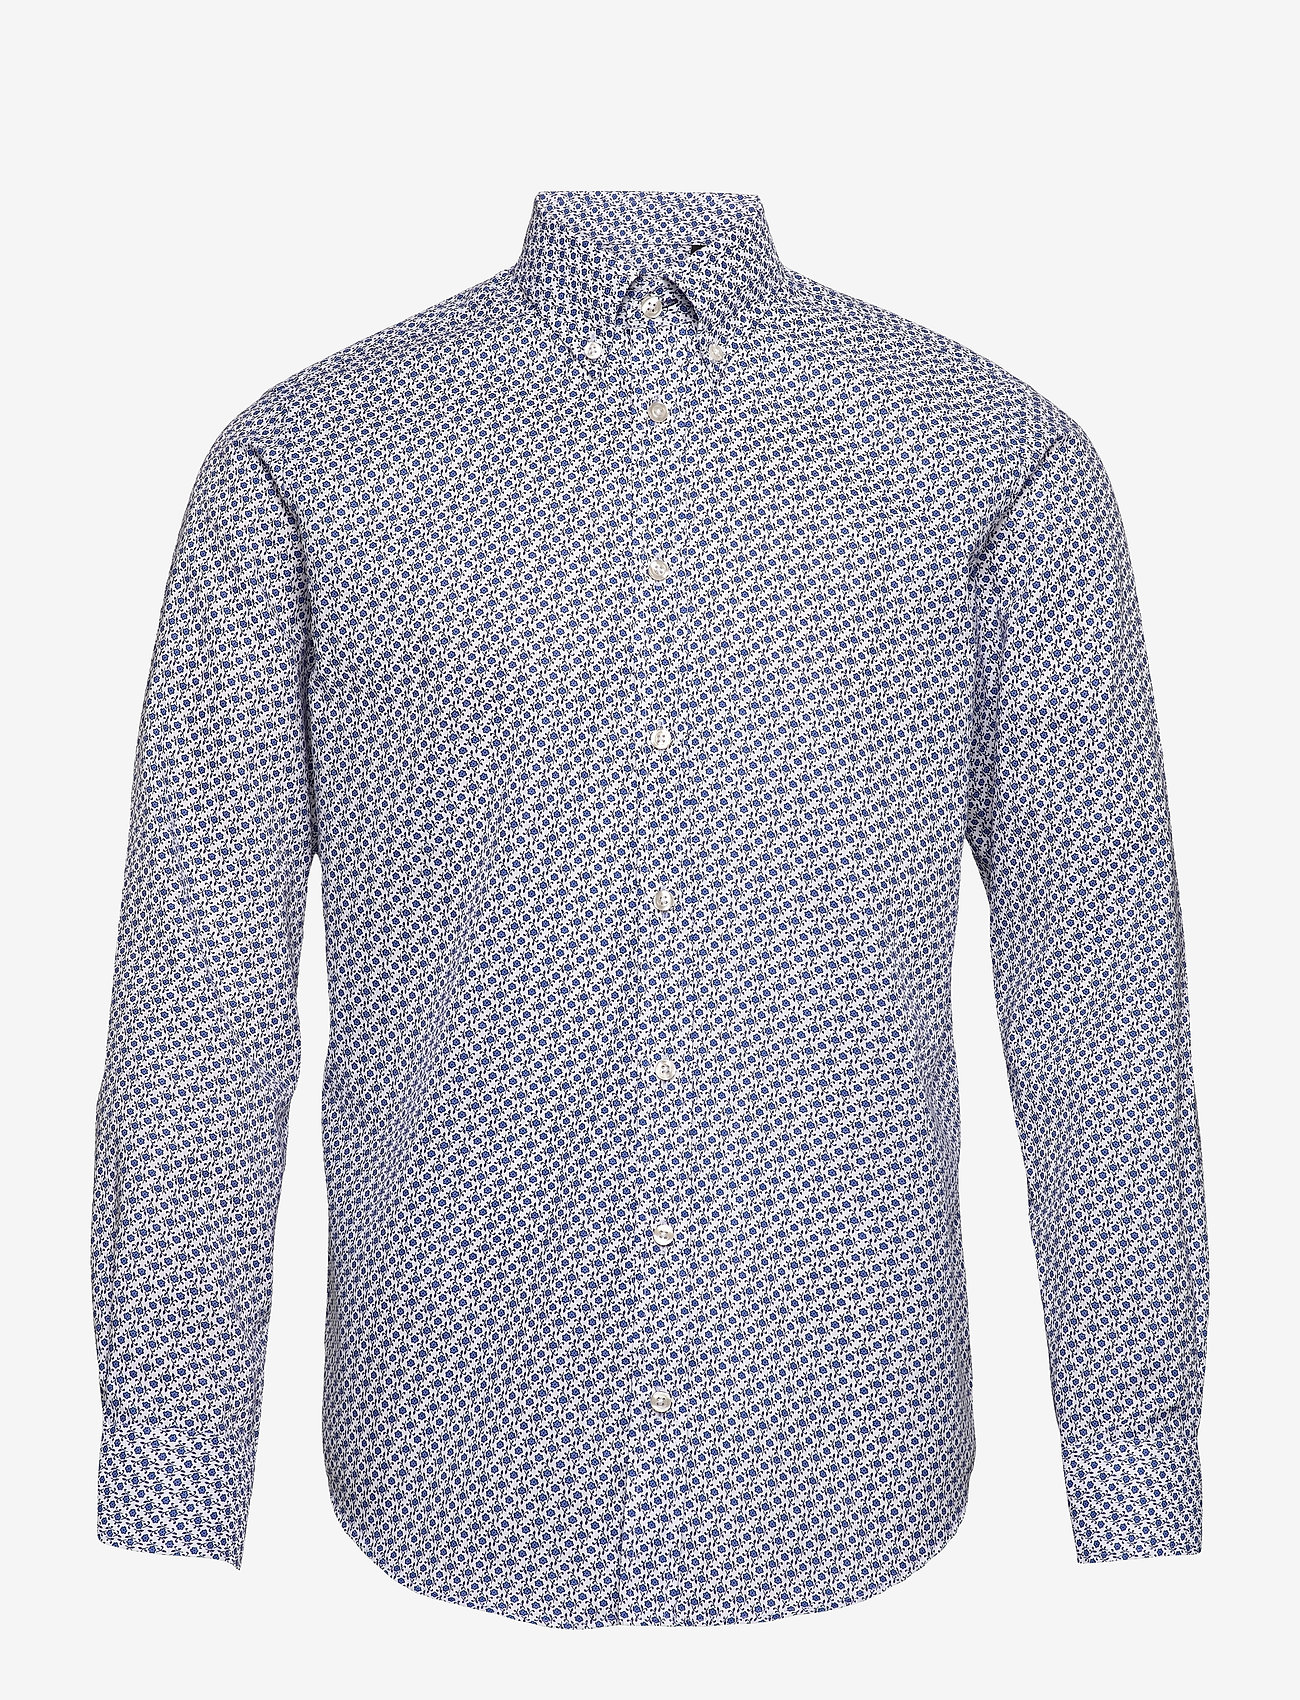 Bosweel Shirts Est. 1937 - Small flowers on white Oxford - chemises décontractées - blue - 0